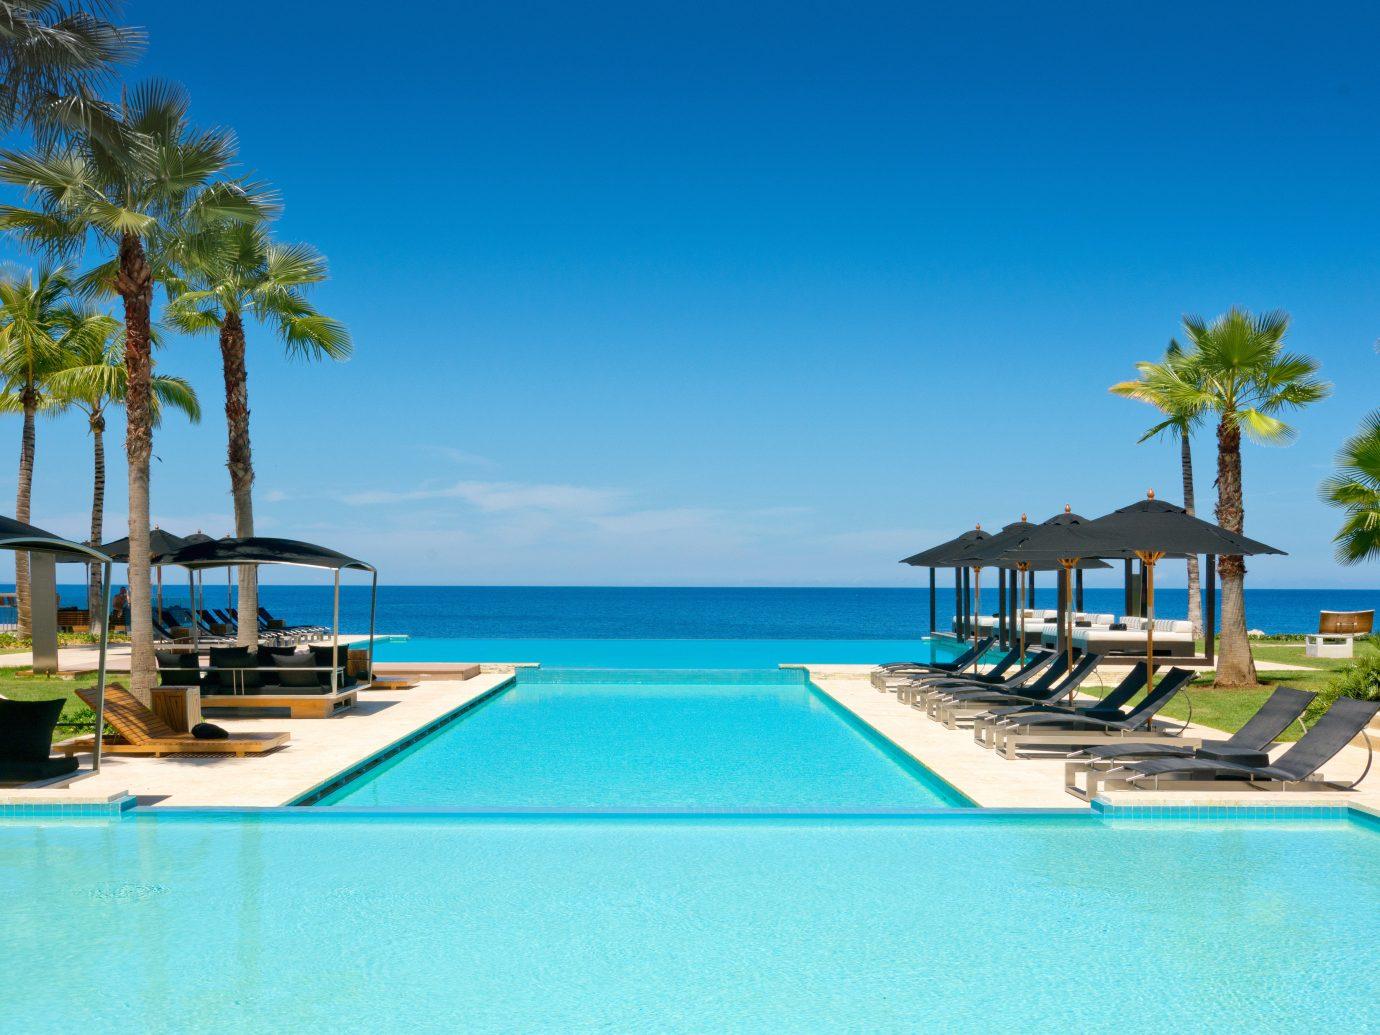 Pool At Gansevoort In Dominican Republic